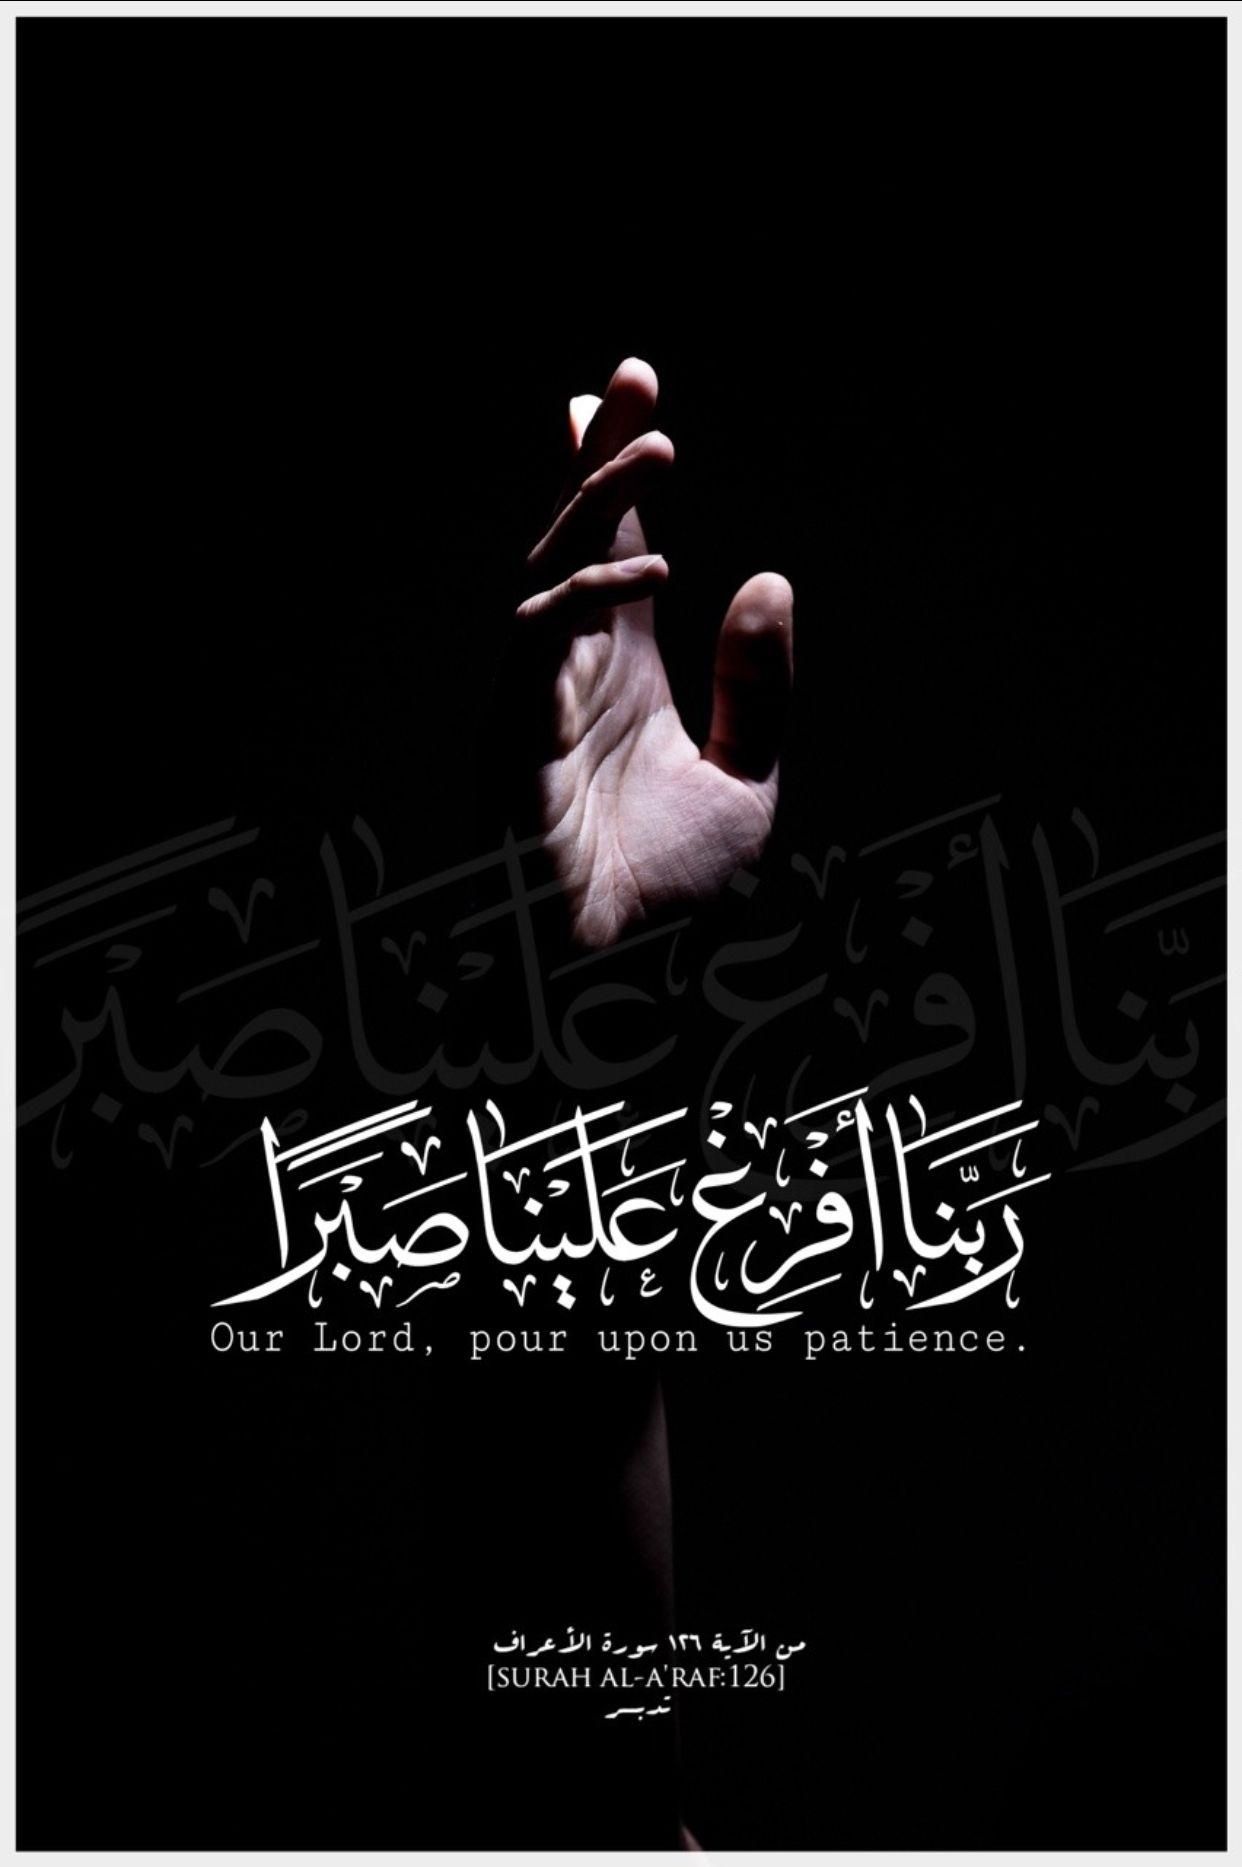 Pin By Noraida Ahmad On Quran Verses Islamic Quotes Beautiful Quran Quotes Quran Quotes Verses Quran Quotes